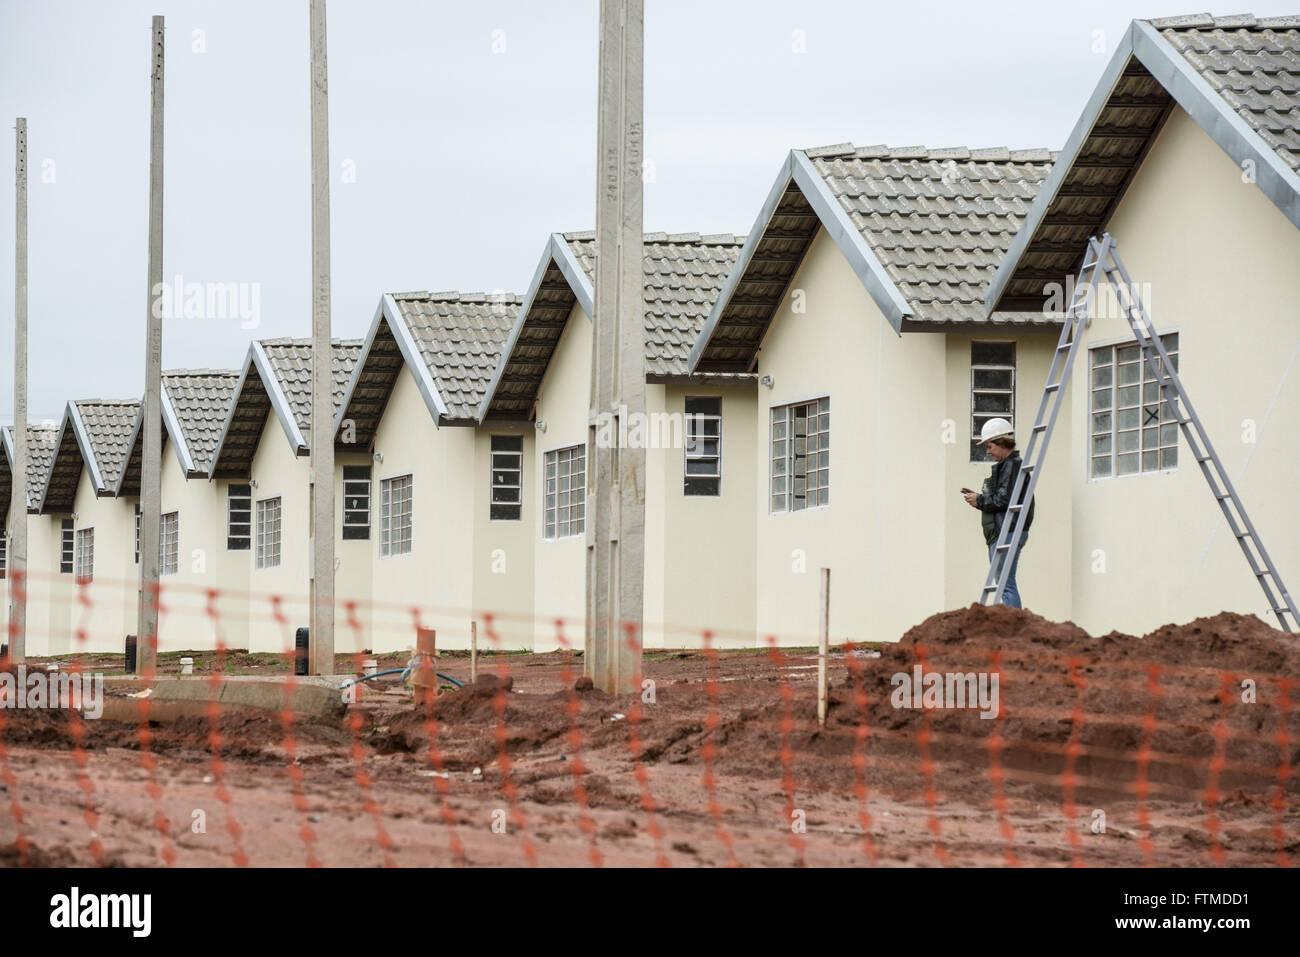 Construction of public housing program Minha Casa Minha Vida - Stock Image